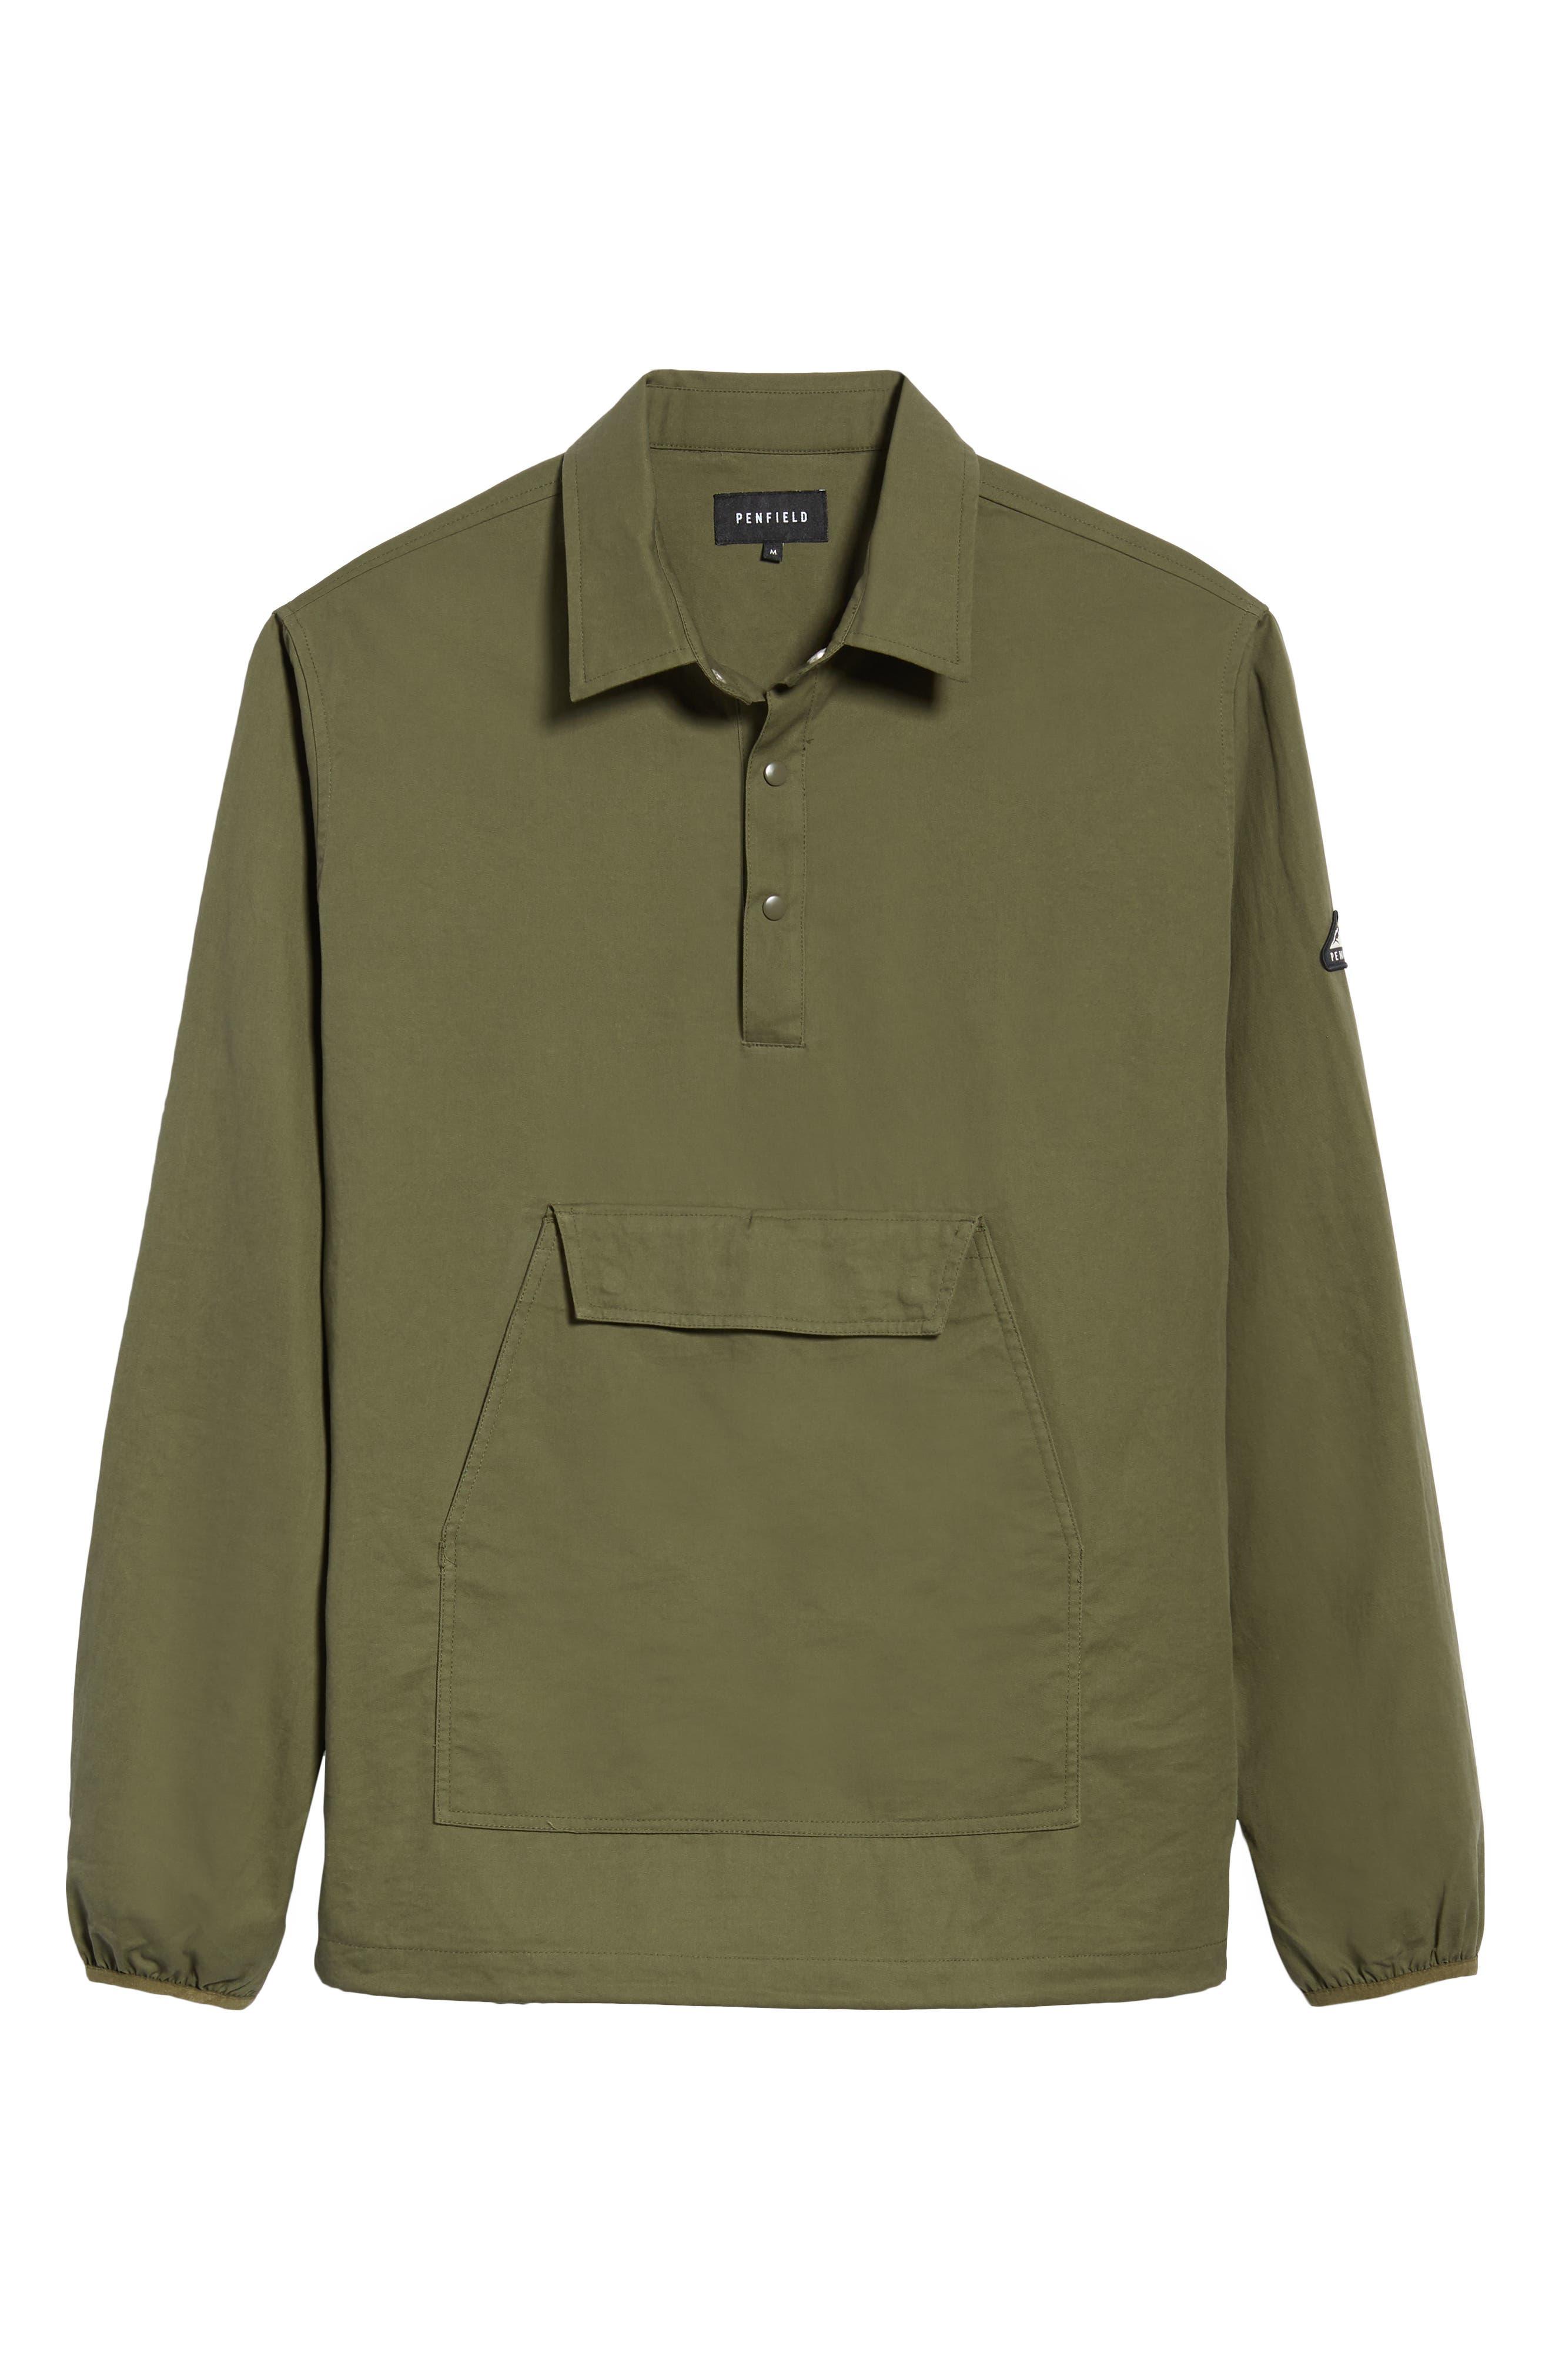 Adelanto Snap Pocket Shirt,                             Alternate thumbnail 6, color,                             DARK OLIVE